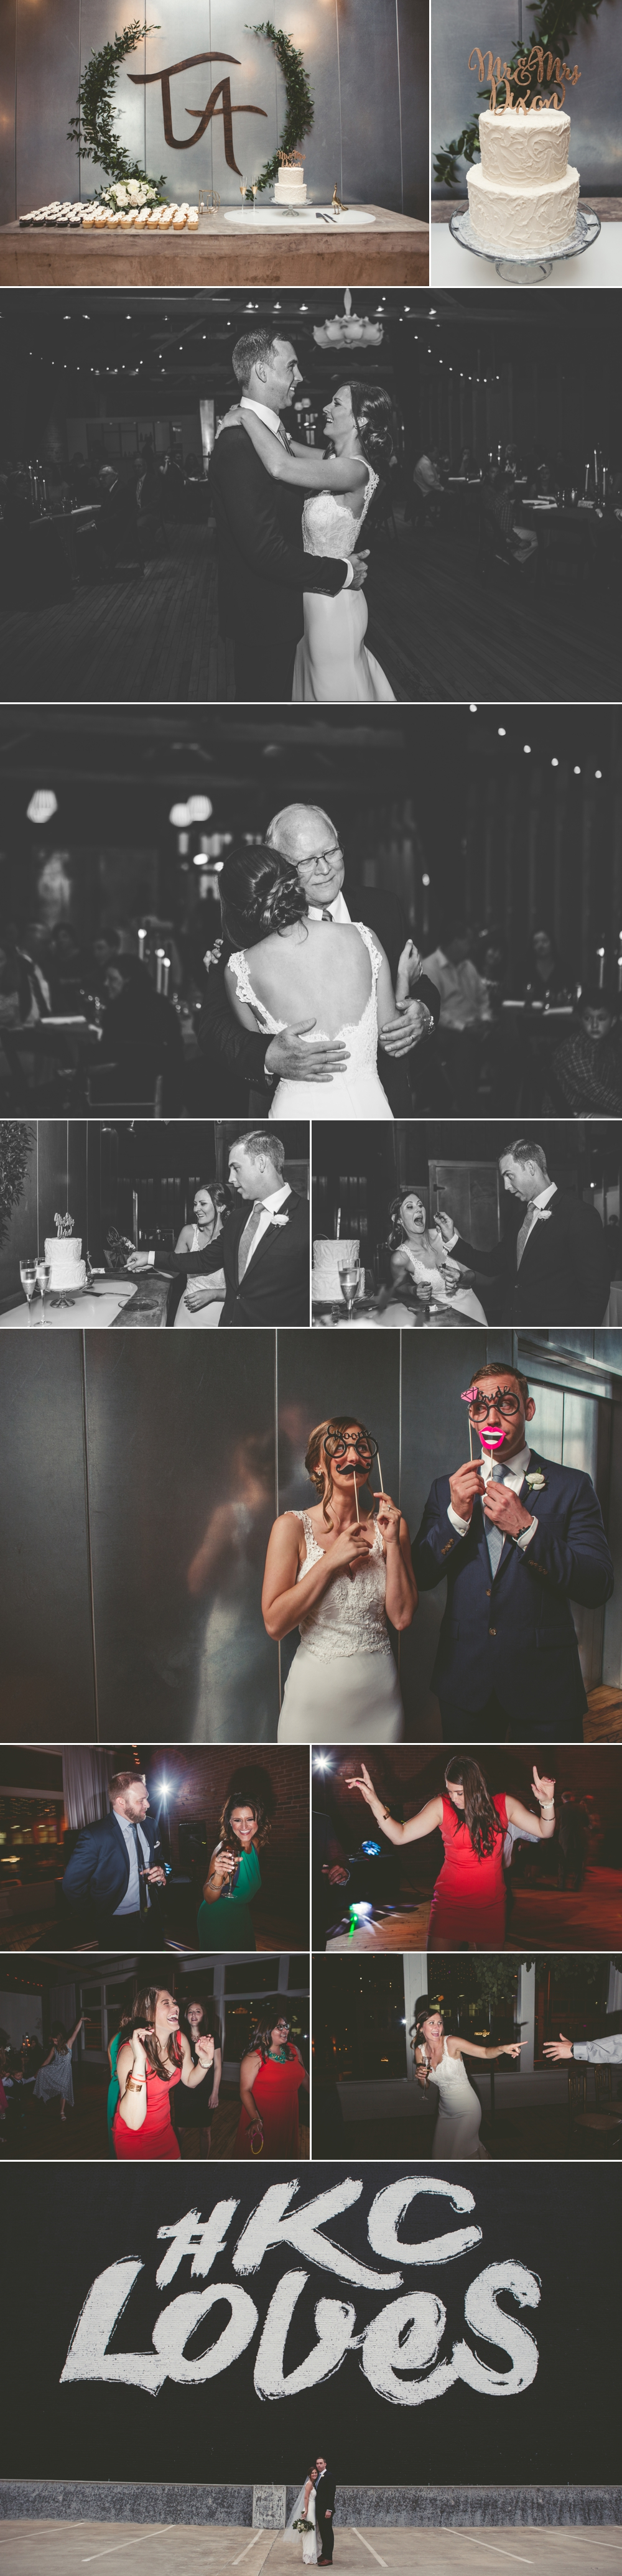 jason_domingues_photography_best_kansas_city_wedding_photographer_kc_weddings_berg_0003.jpg